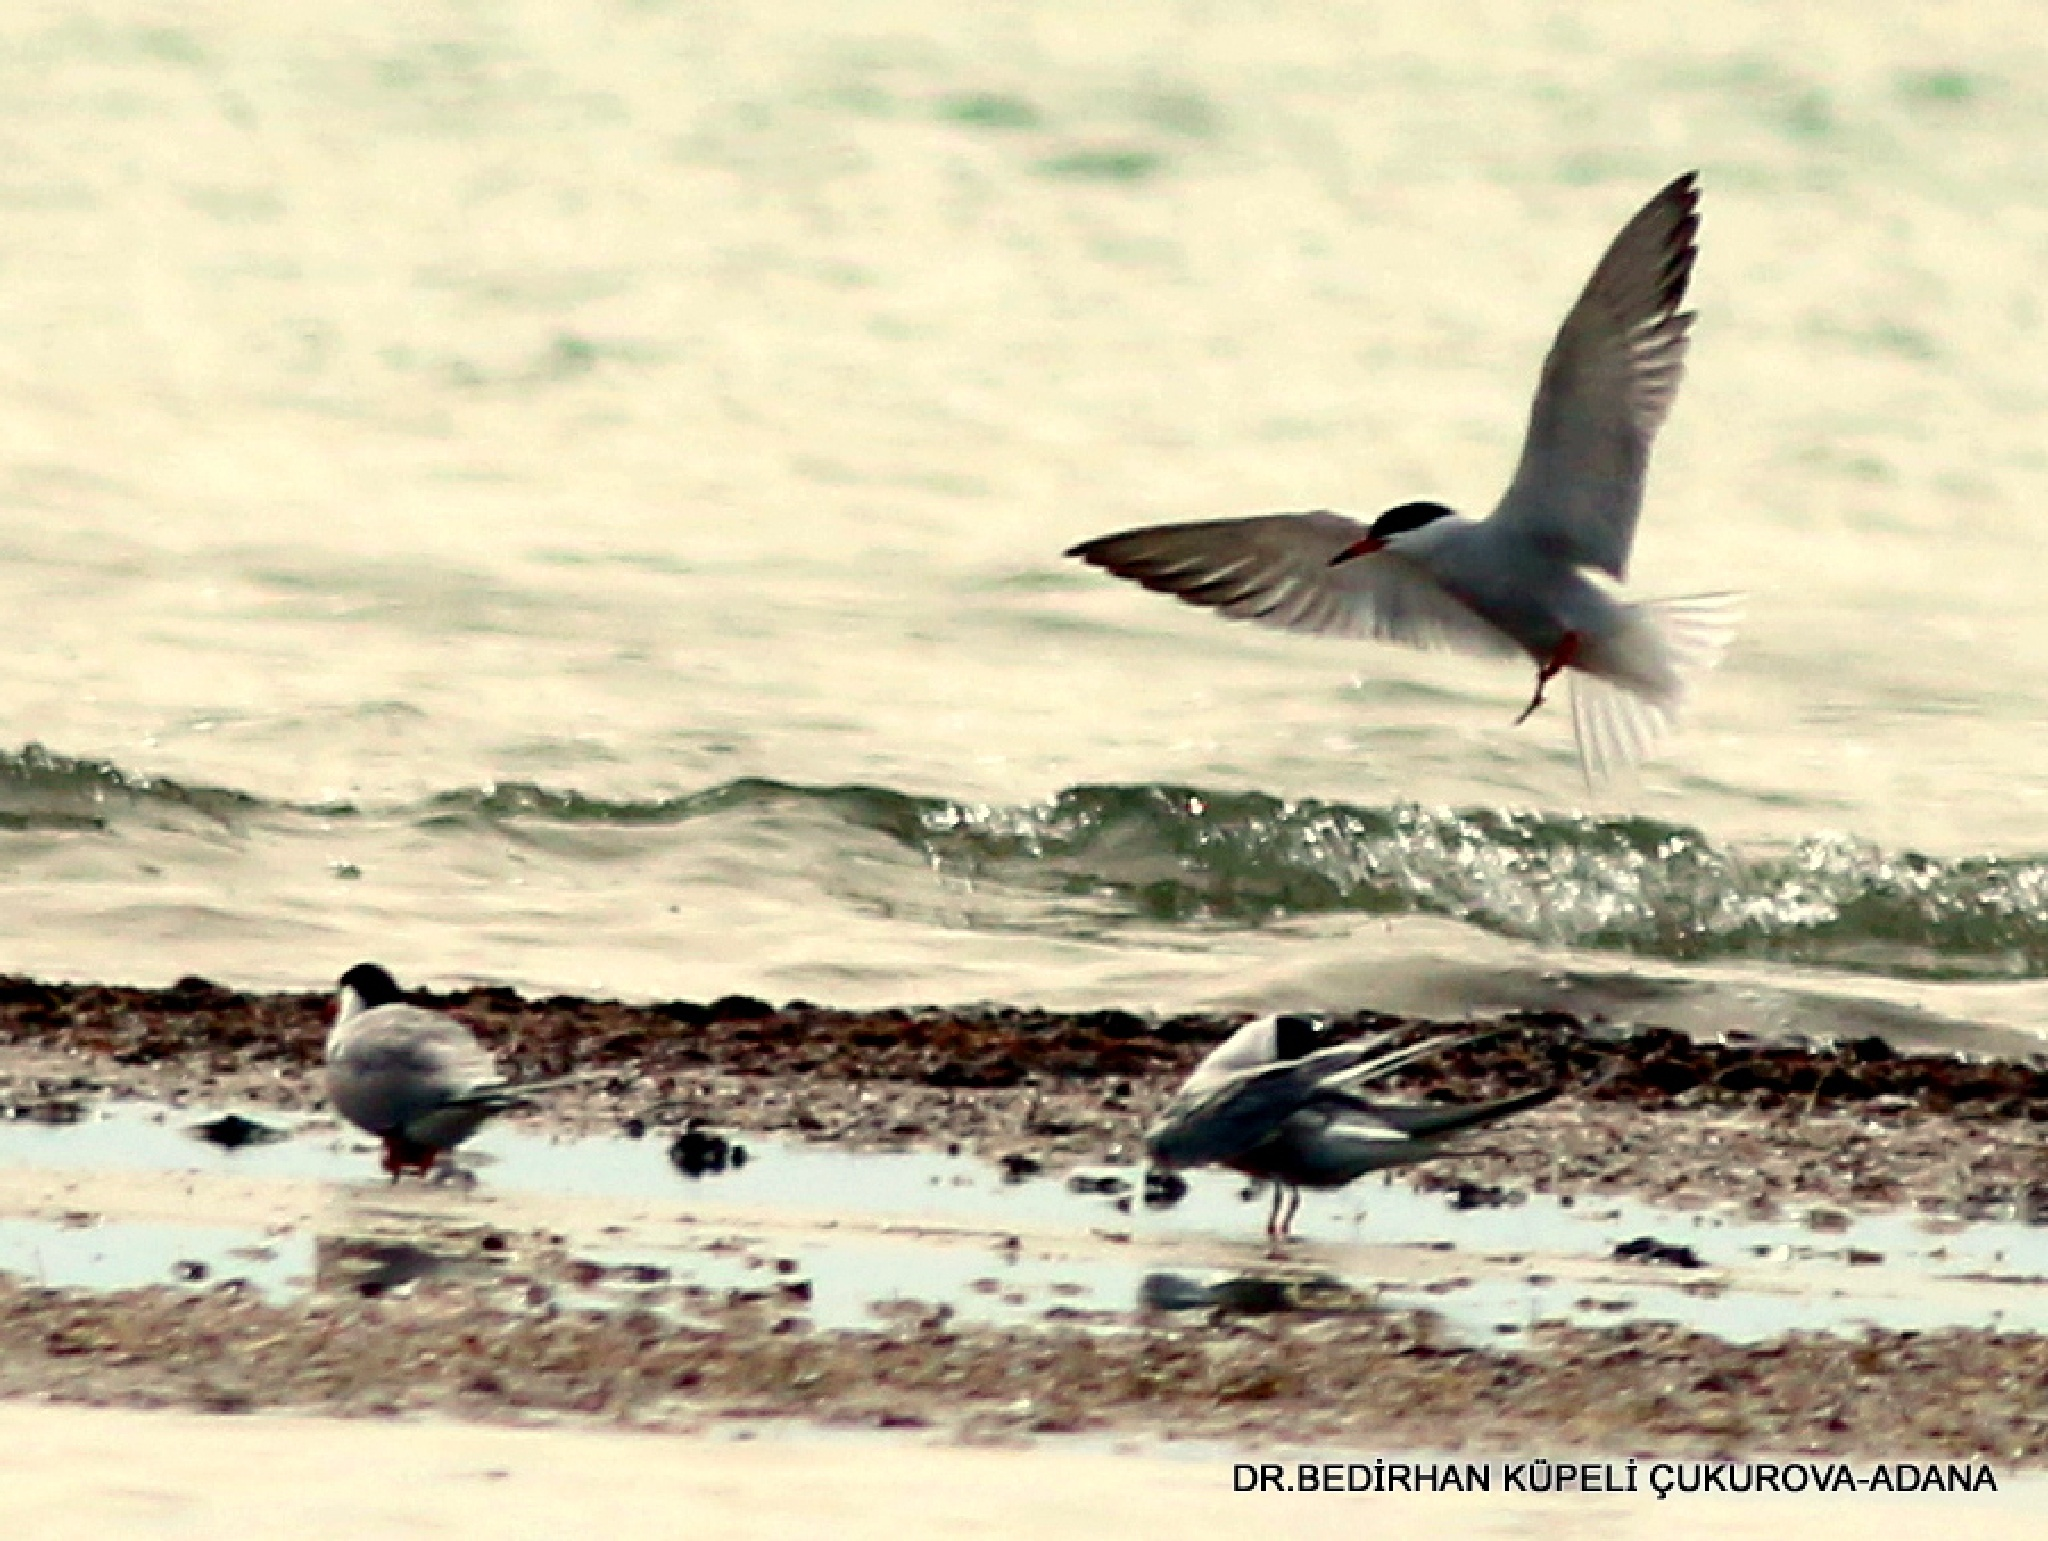 Little Terns at the seaside by Bedirhan Küpeli